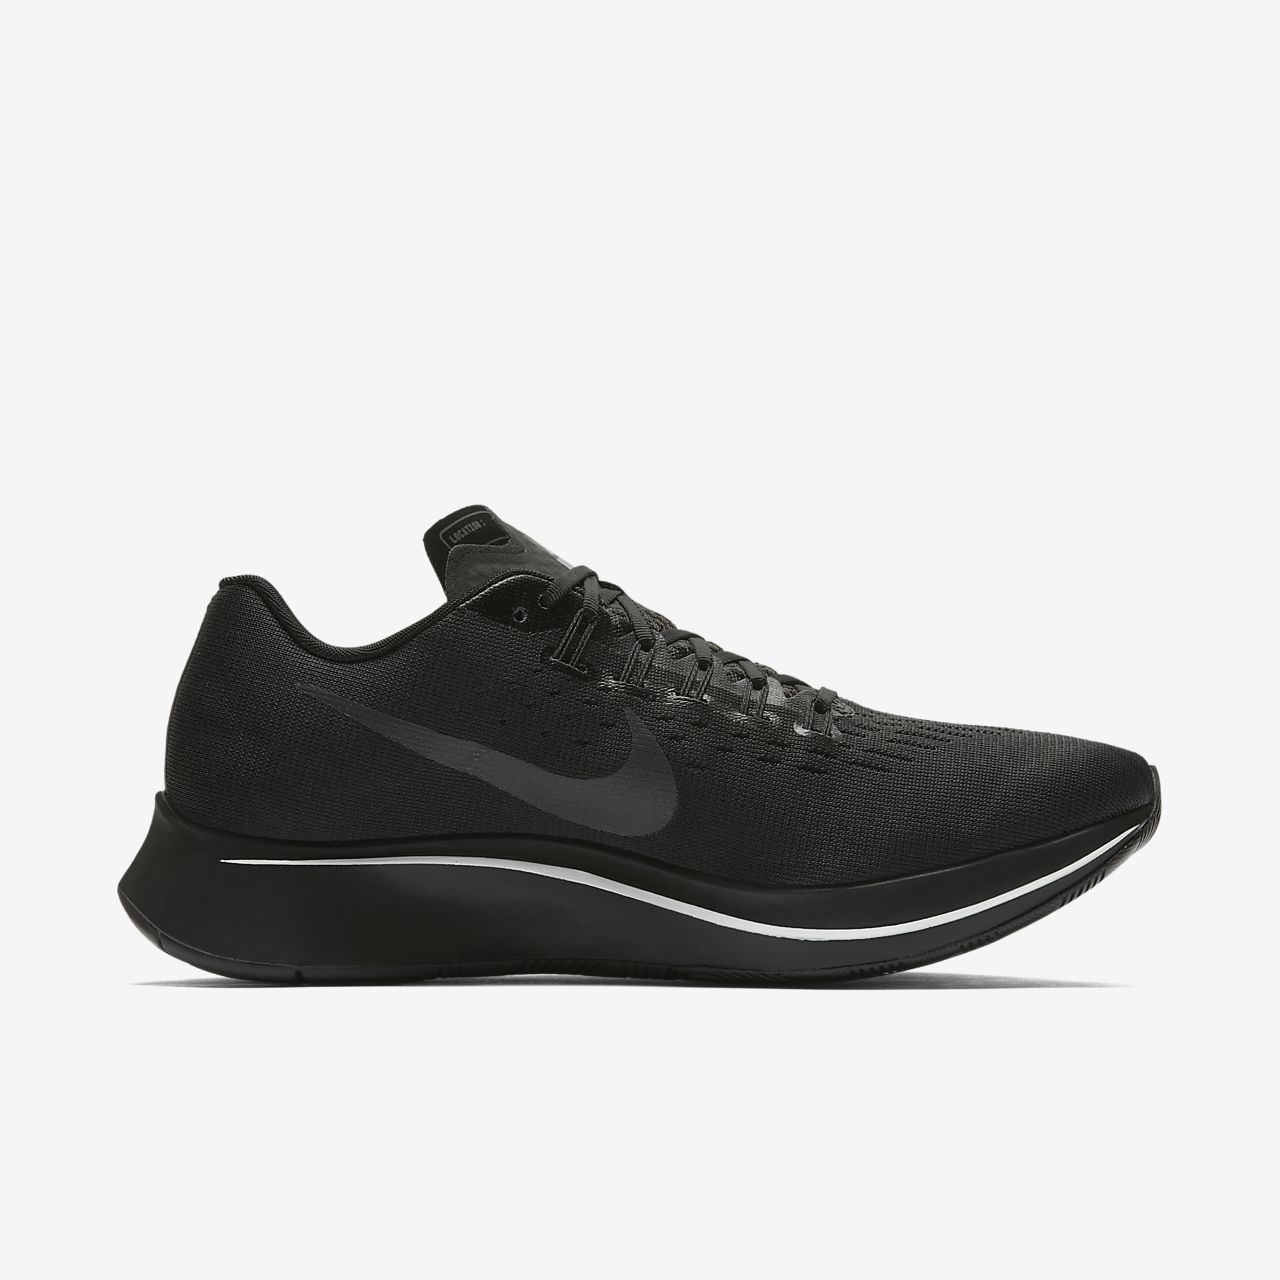 539d114177f Nike Zoom Fly Men s Running Shoe. Nike.com GB